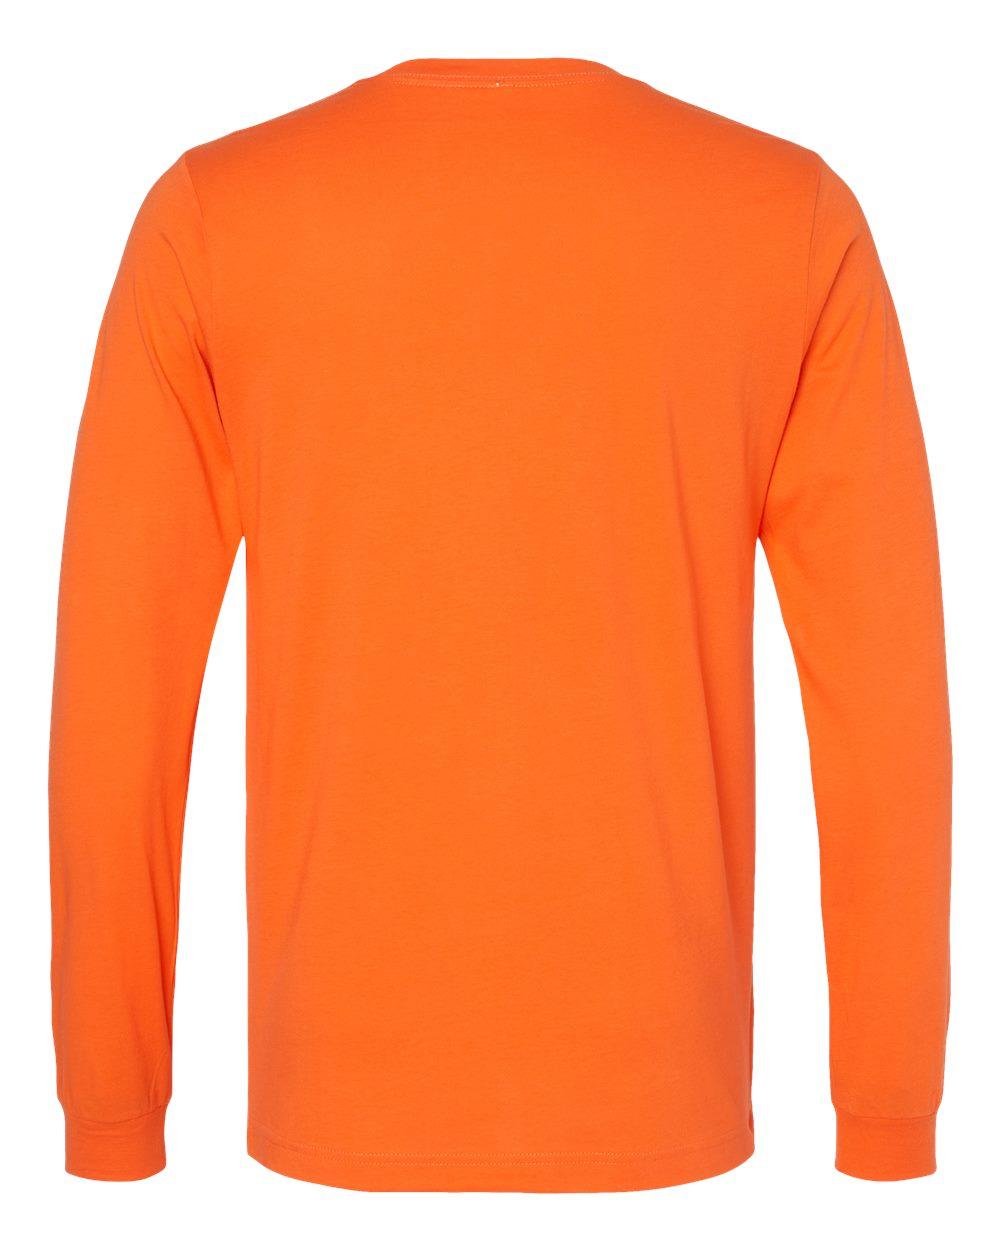 Bella-Canvas-Mens-Blank-Top-Long-Sleeve-Jersey-Tee-T-Shirt-3501-up-to-3XL thumbnail 47